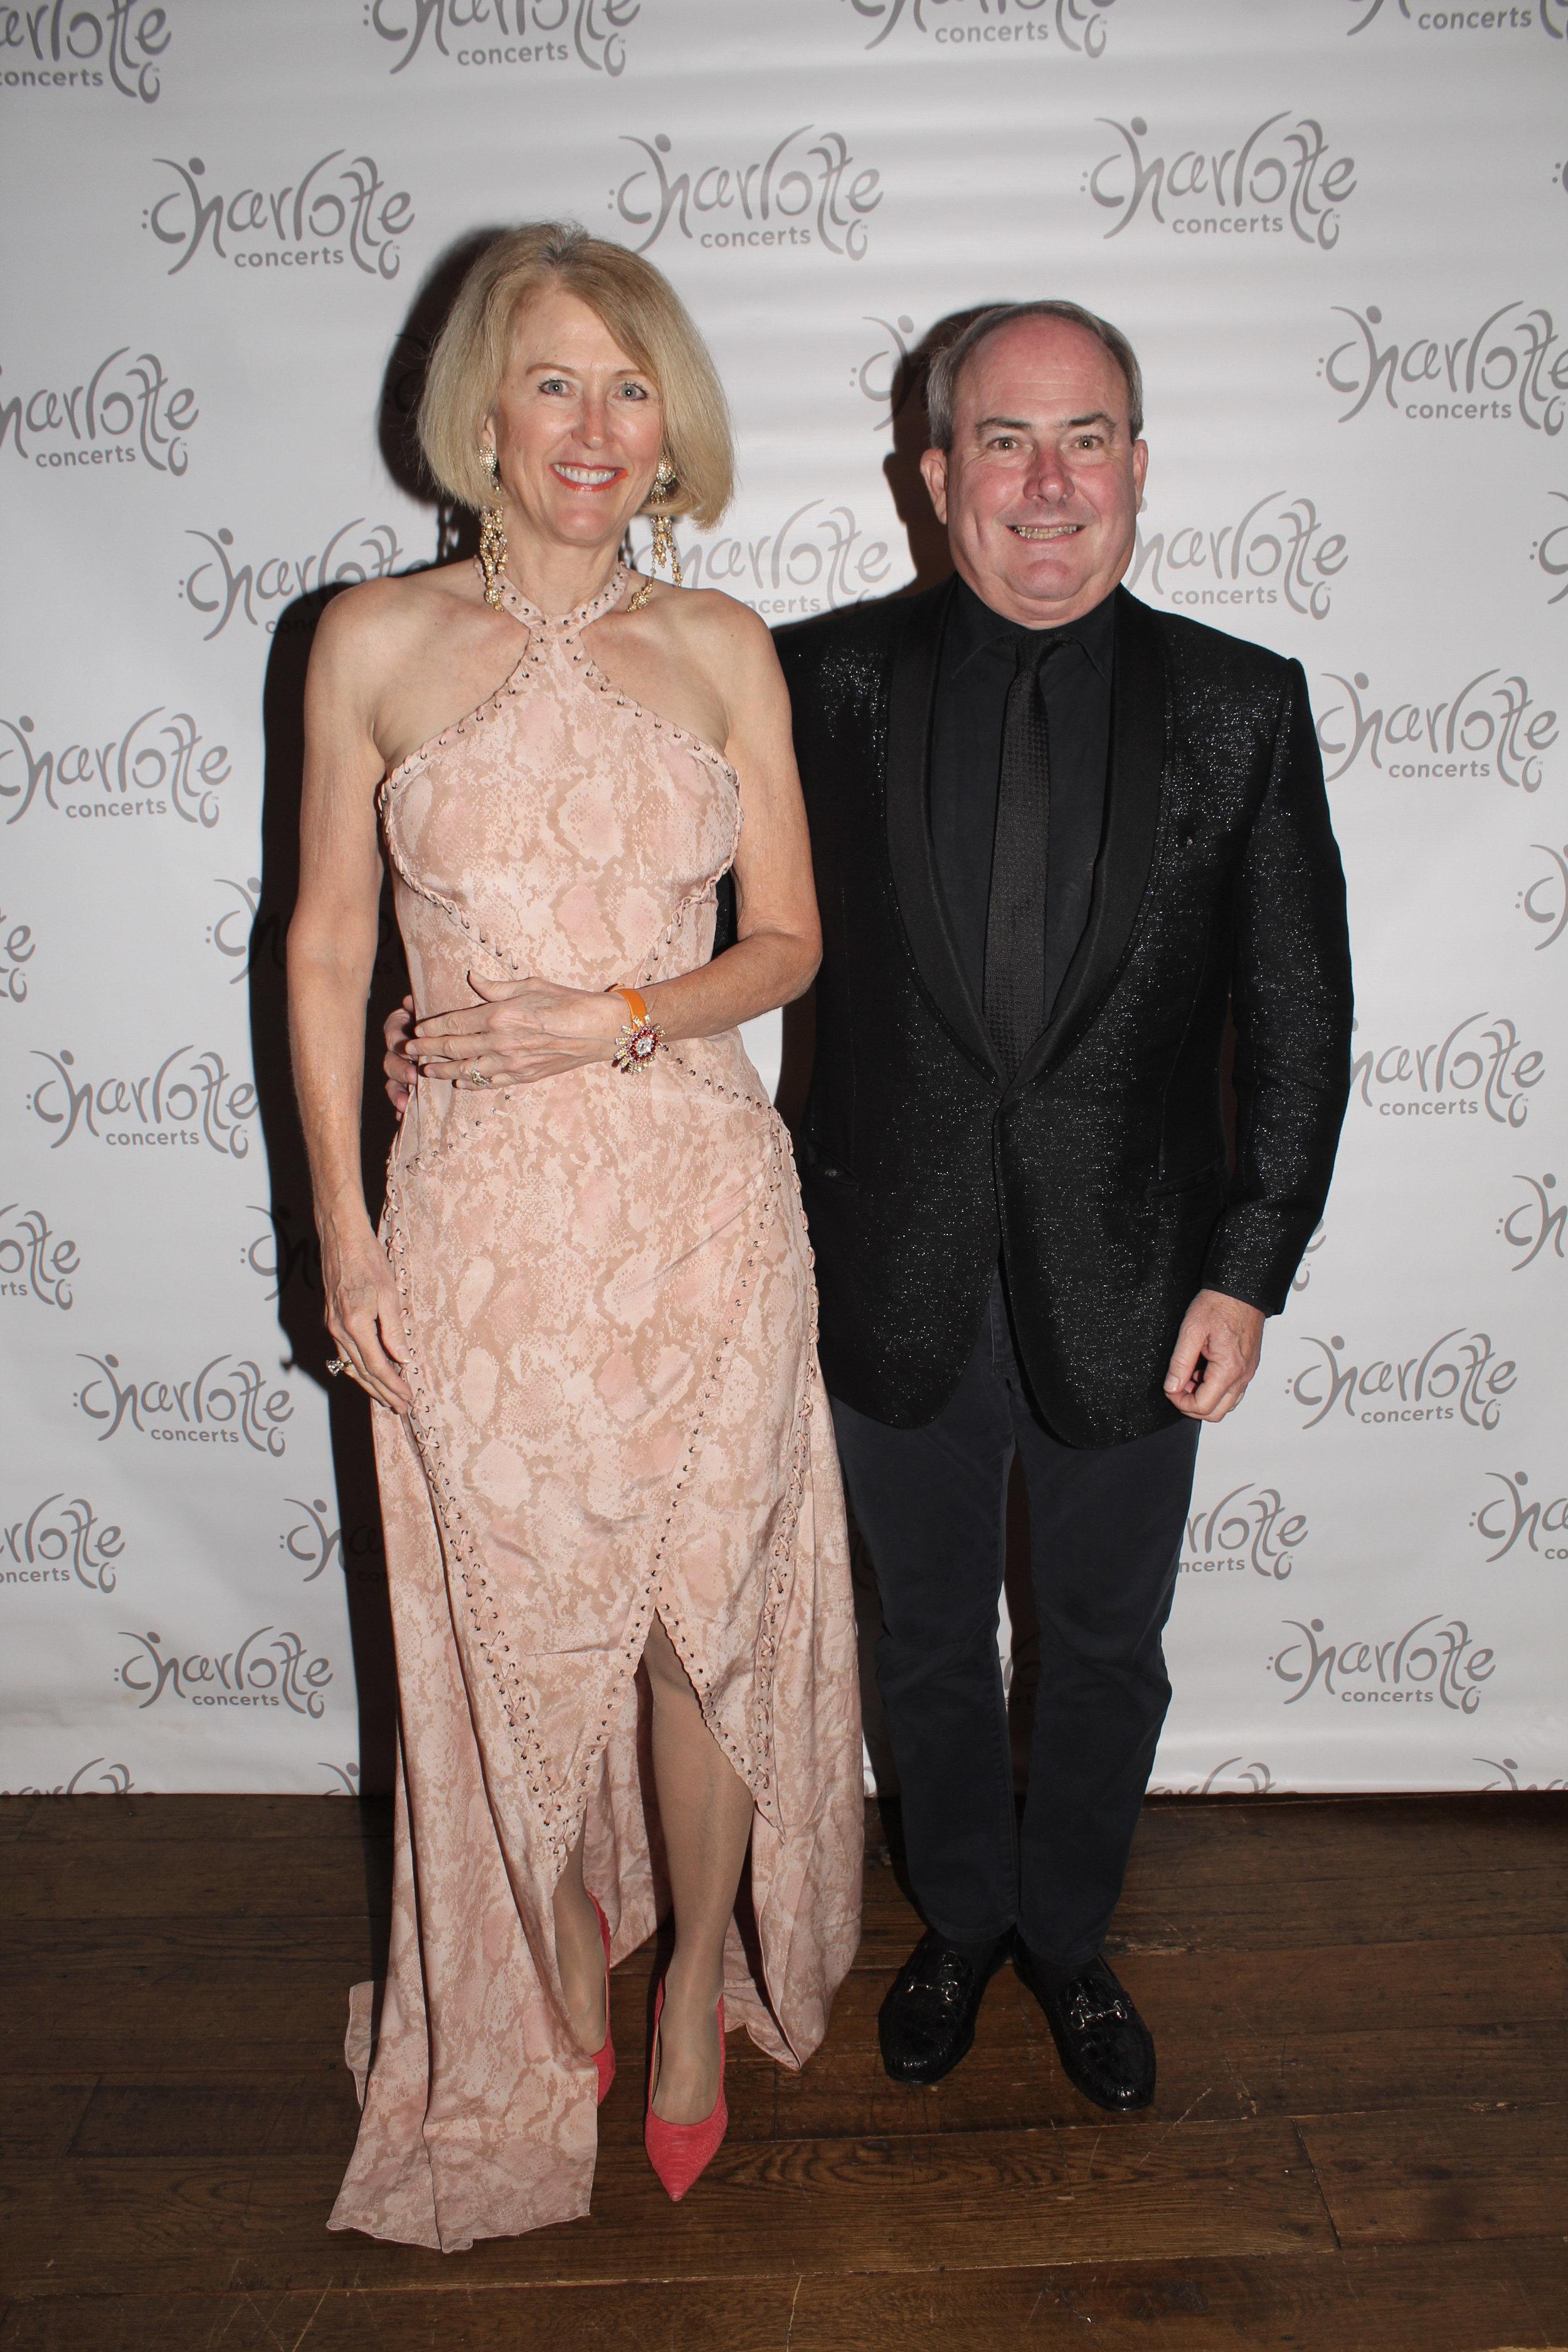 Pam and David Furr